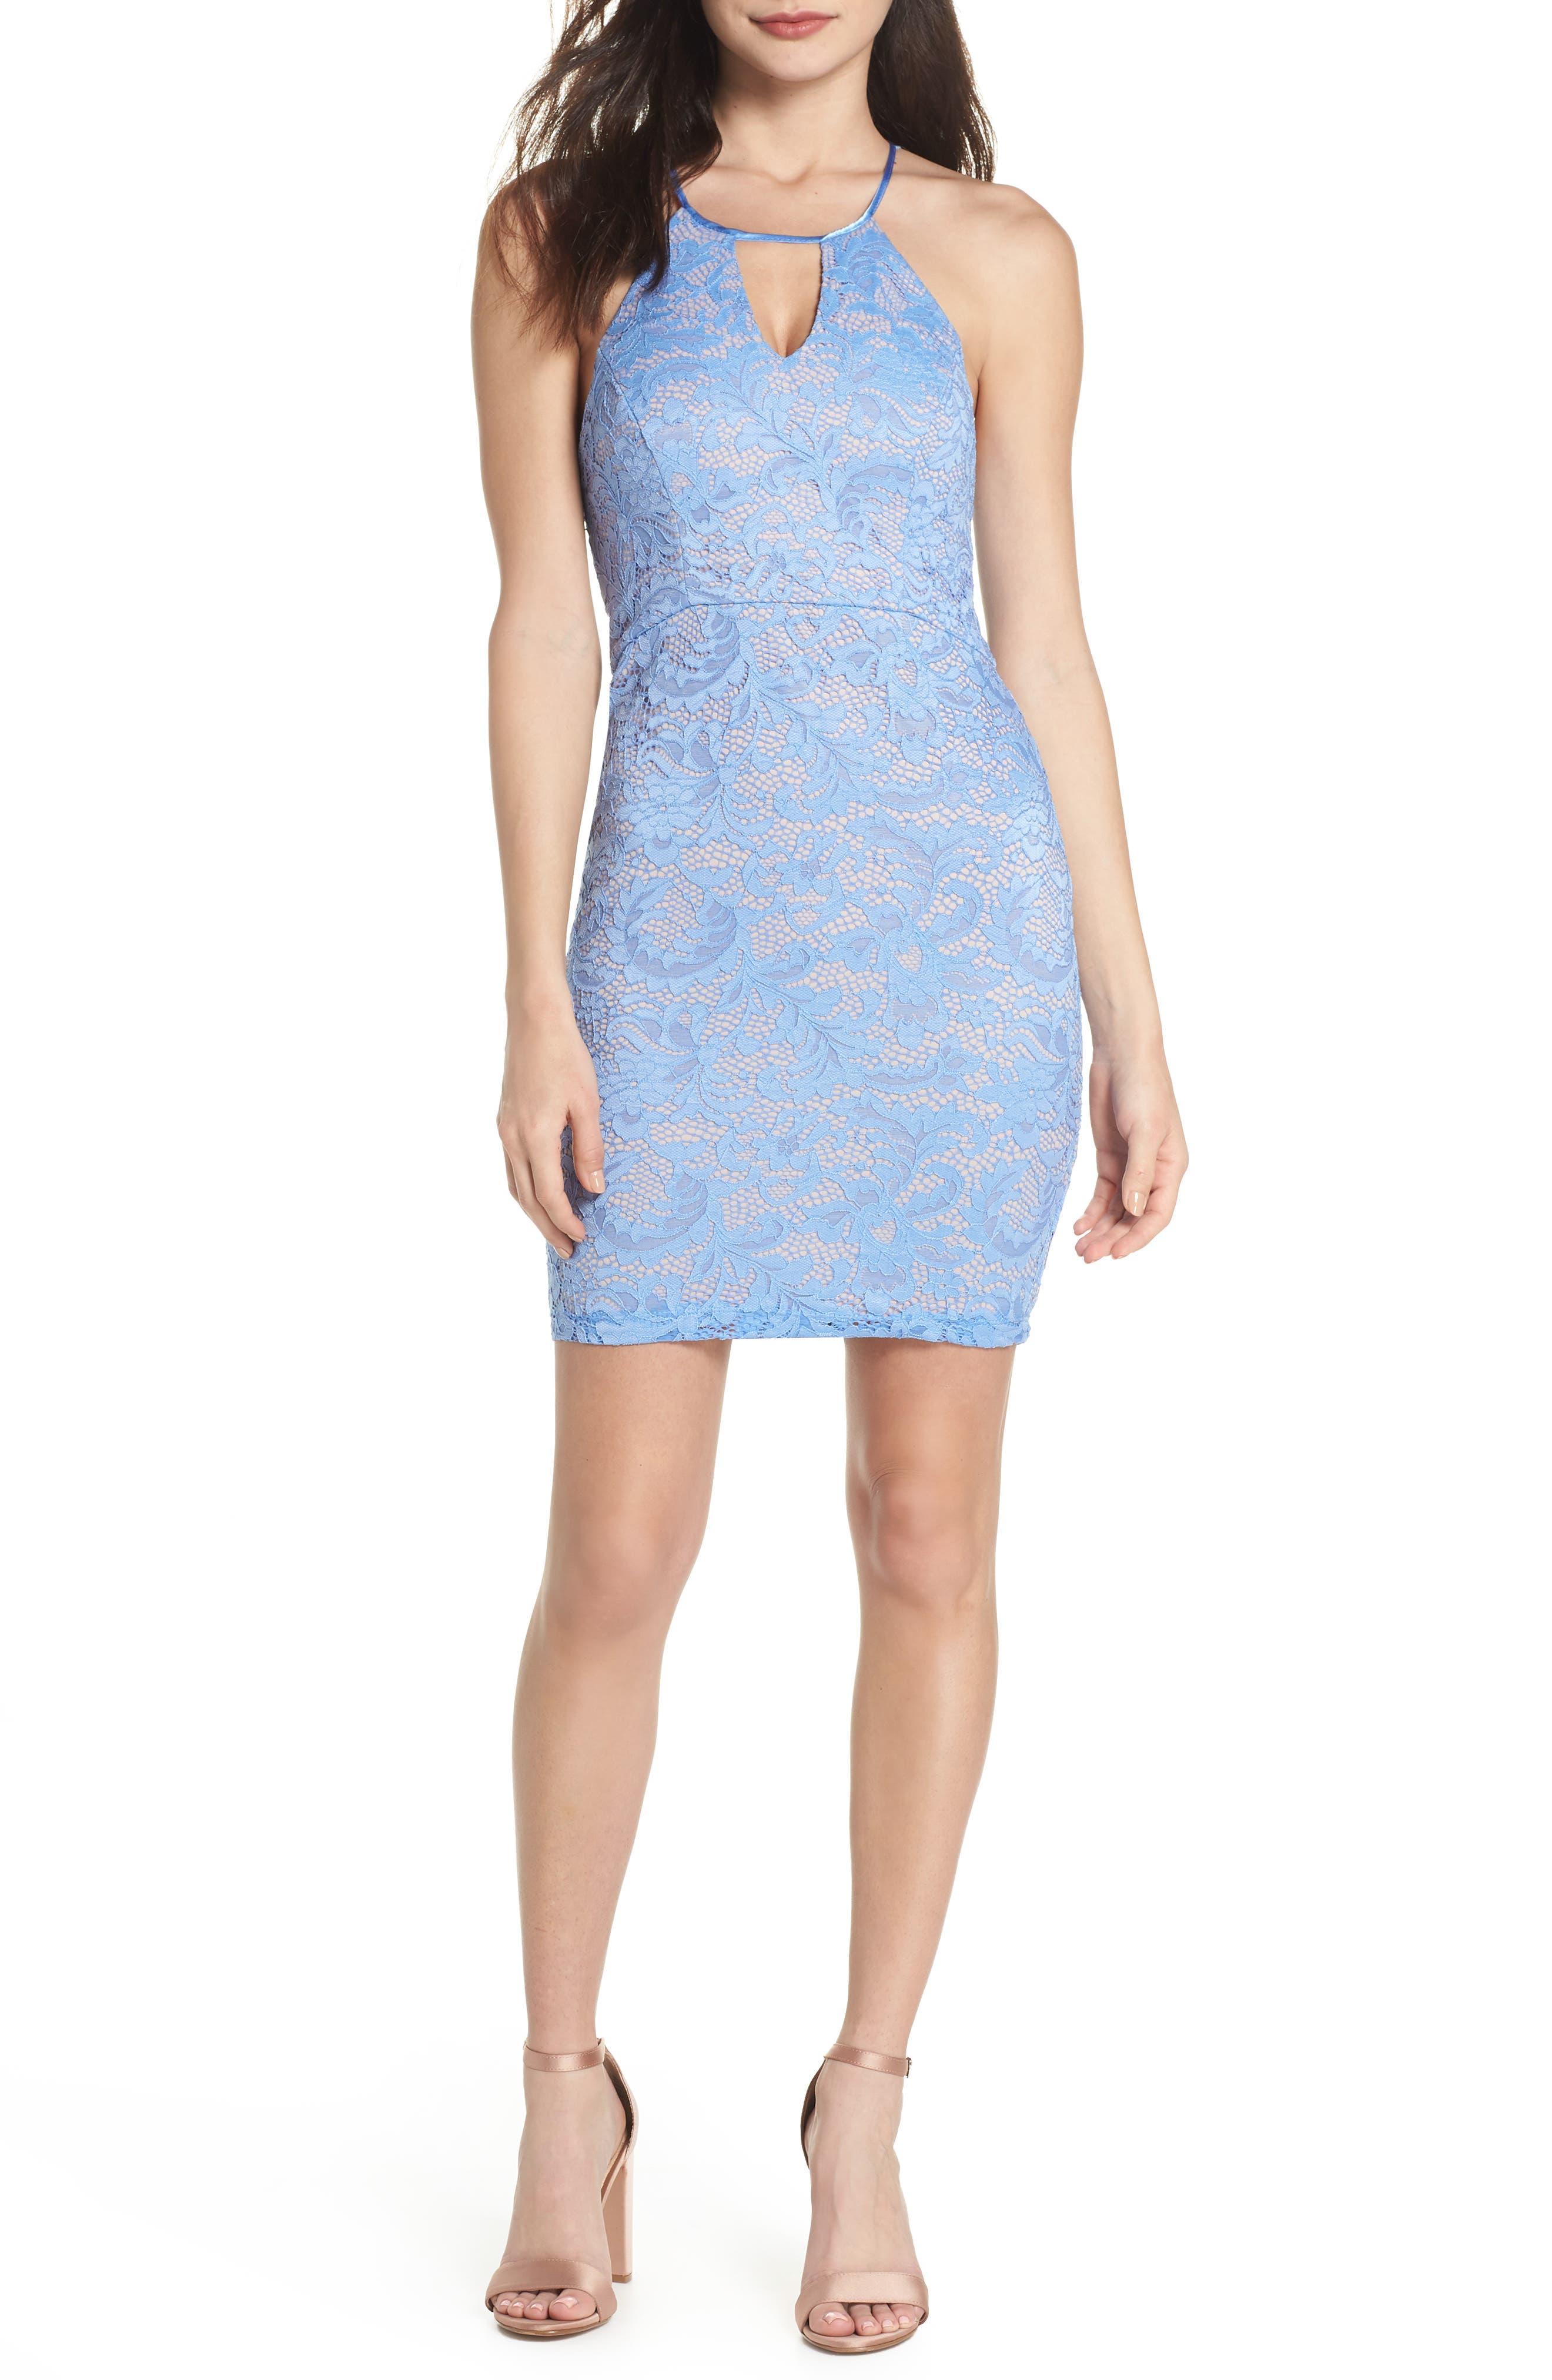 Main Image - Sequin Hearts Racerback Lace Halter Dress